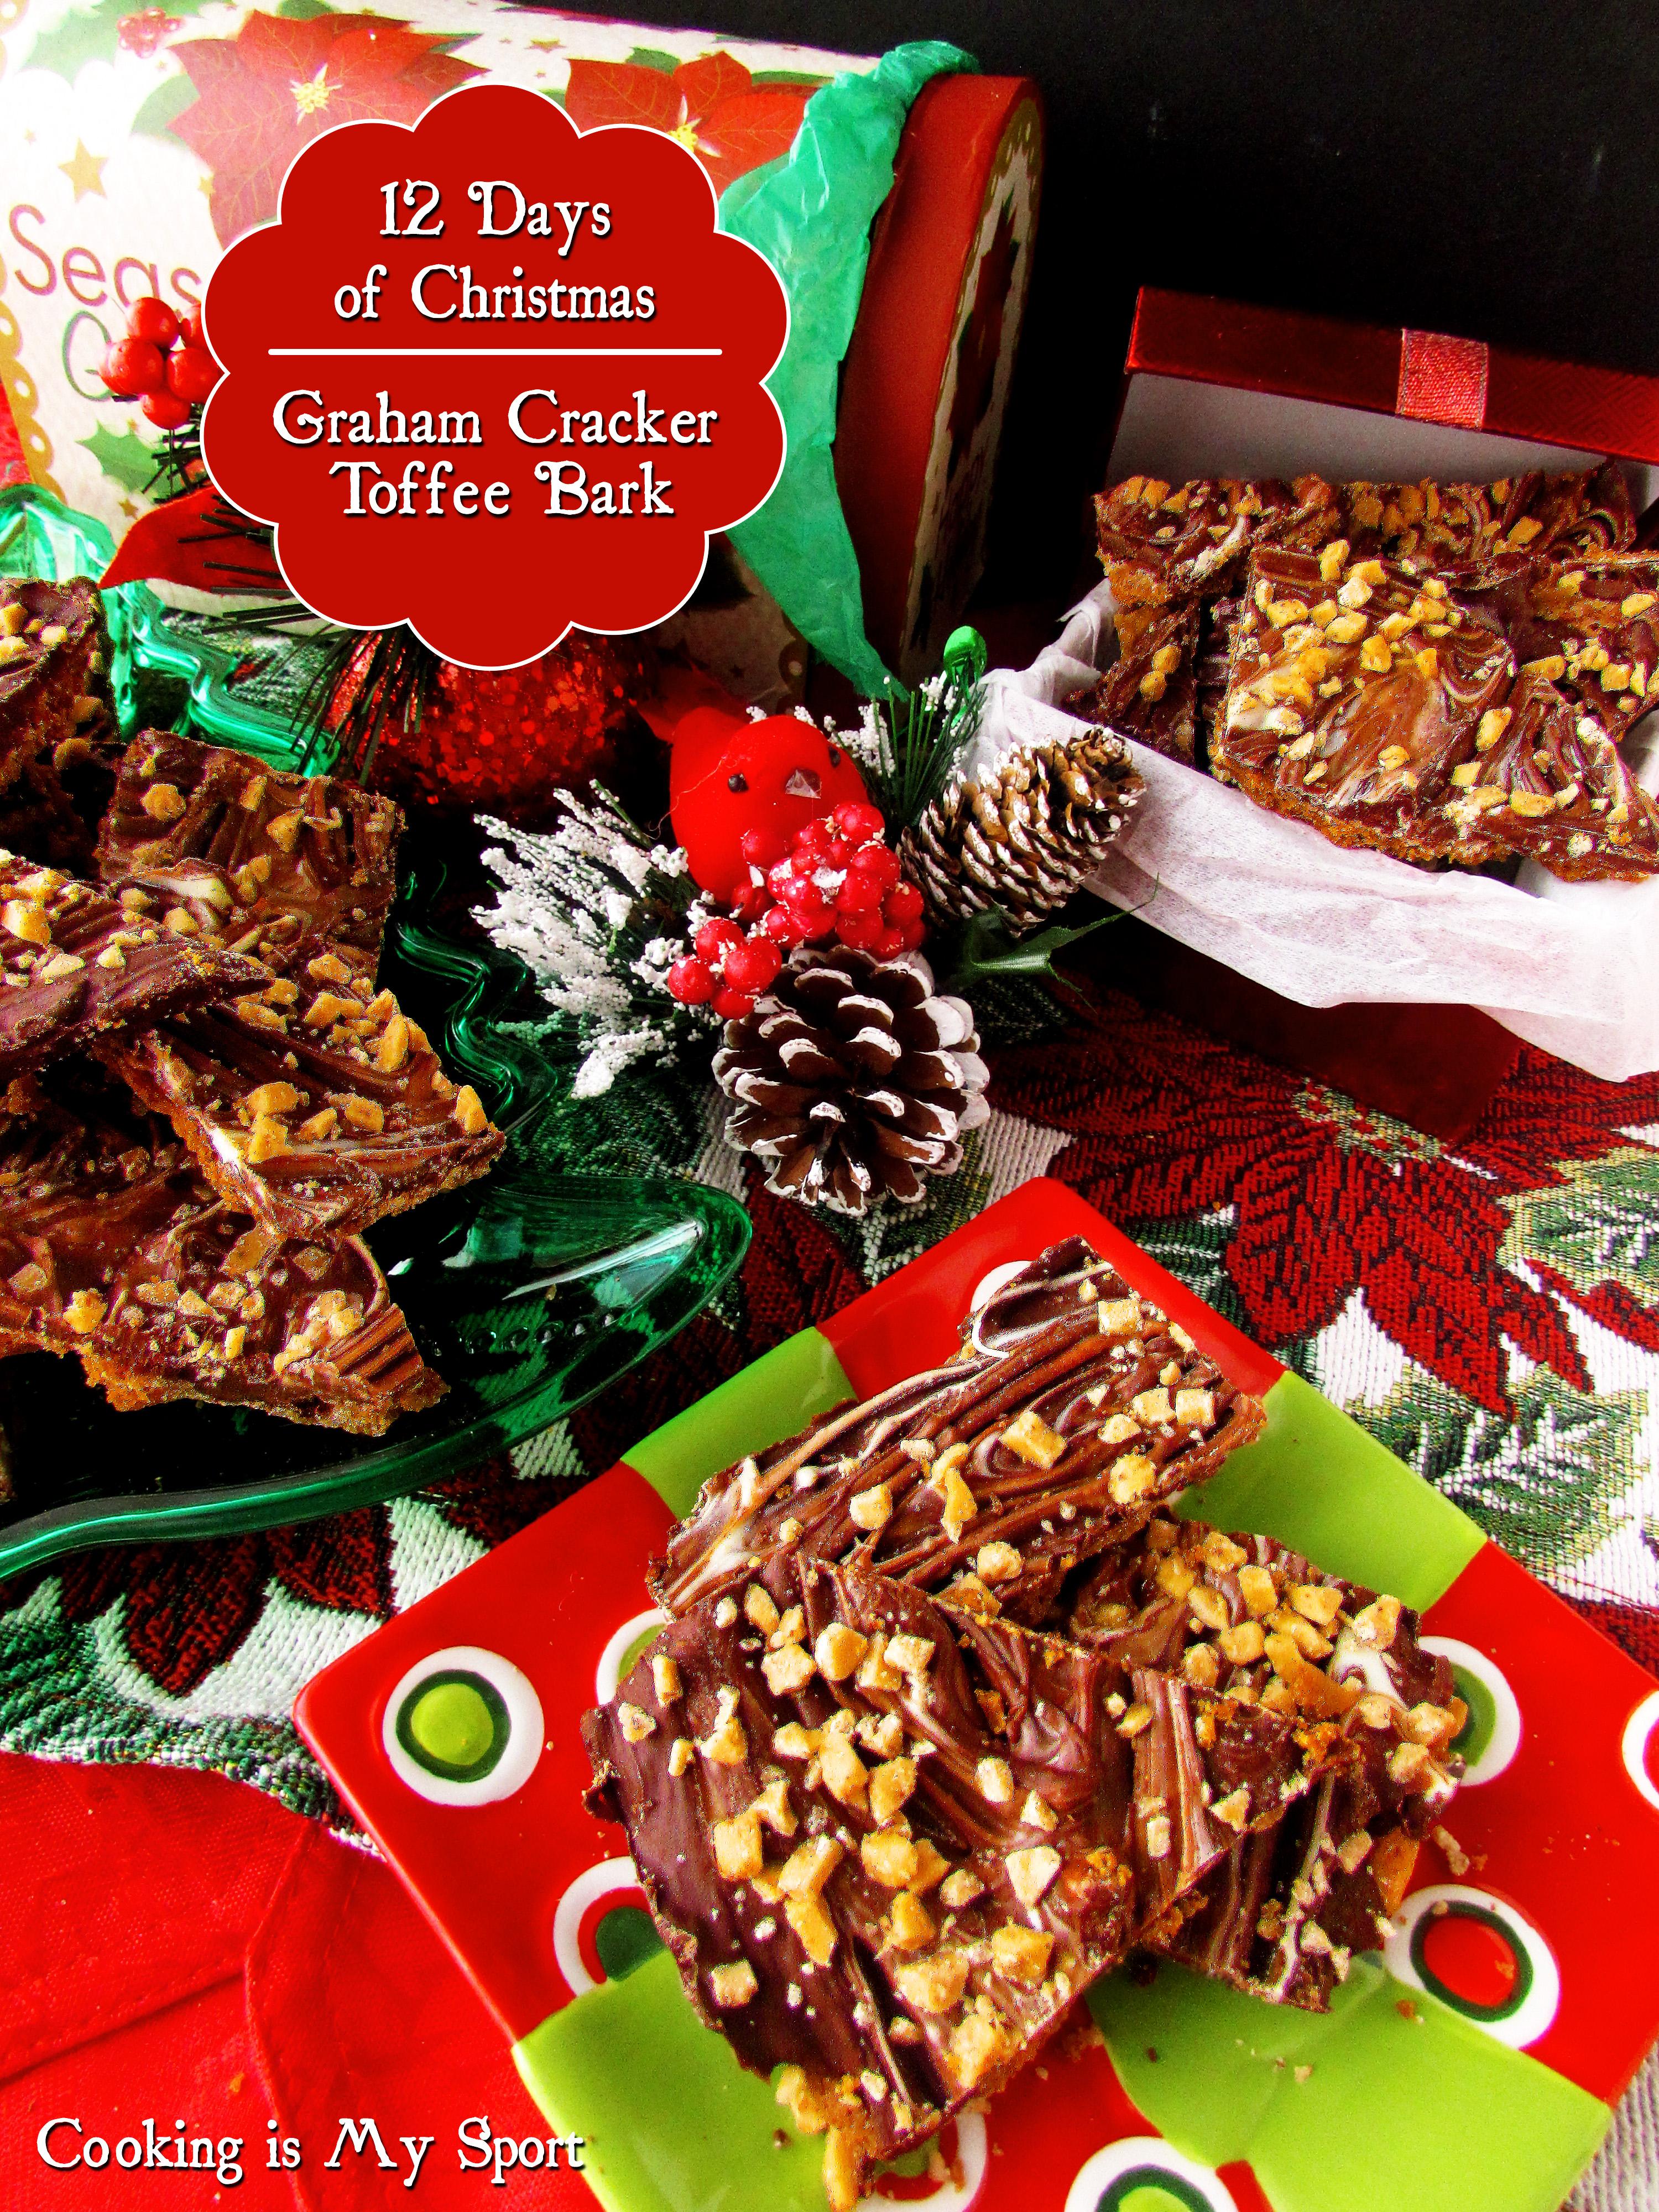 Graham Cracker Toffee Bark5